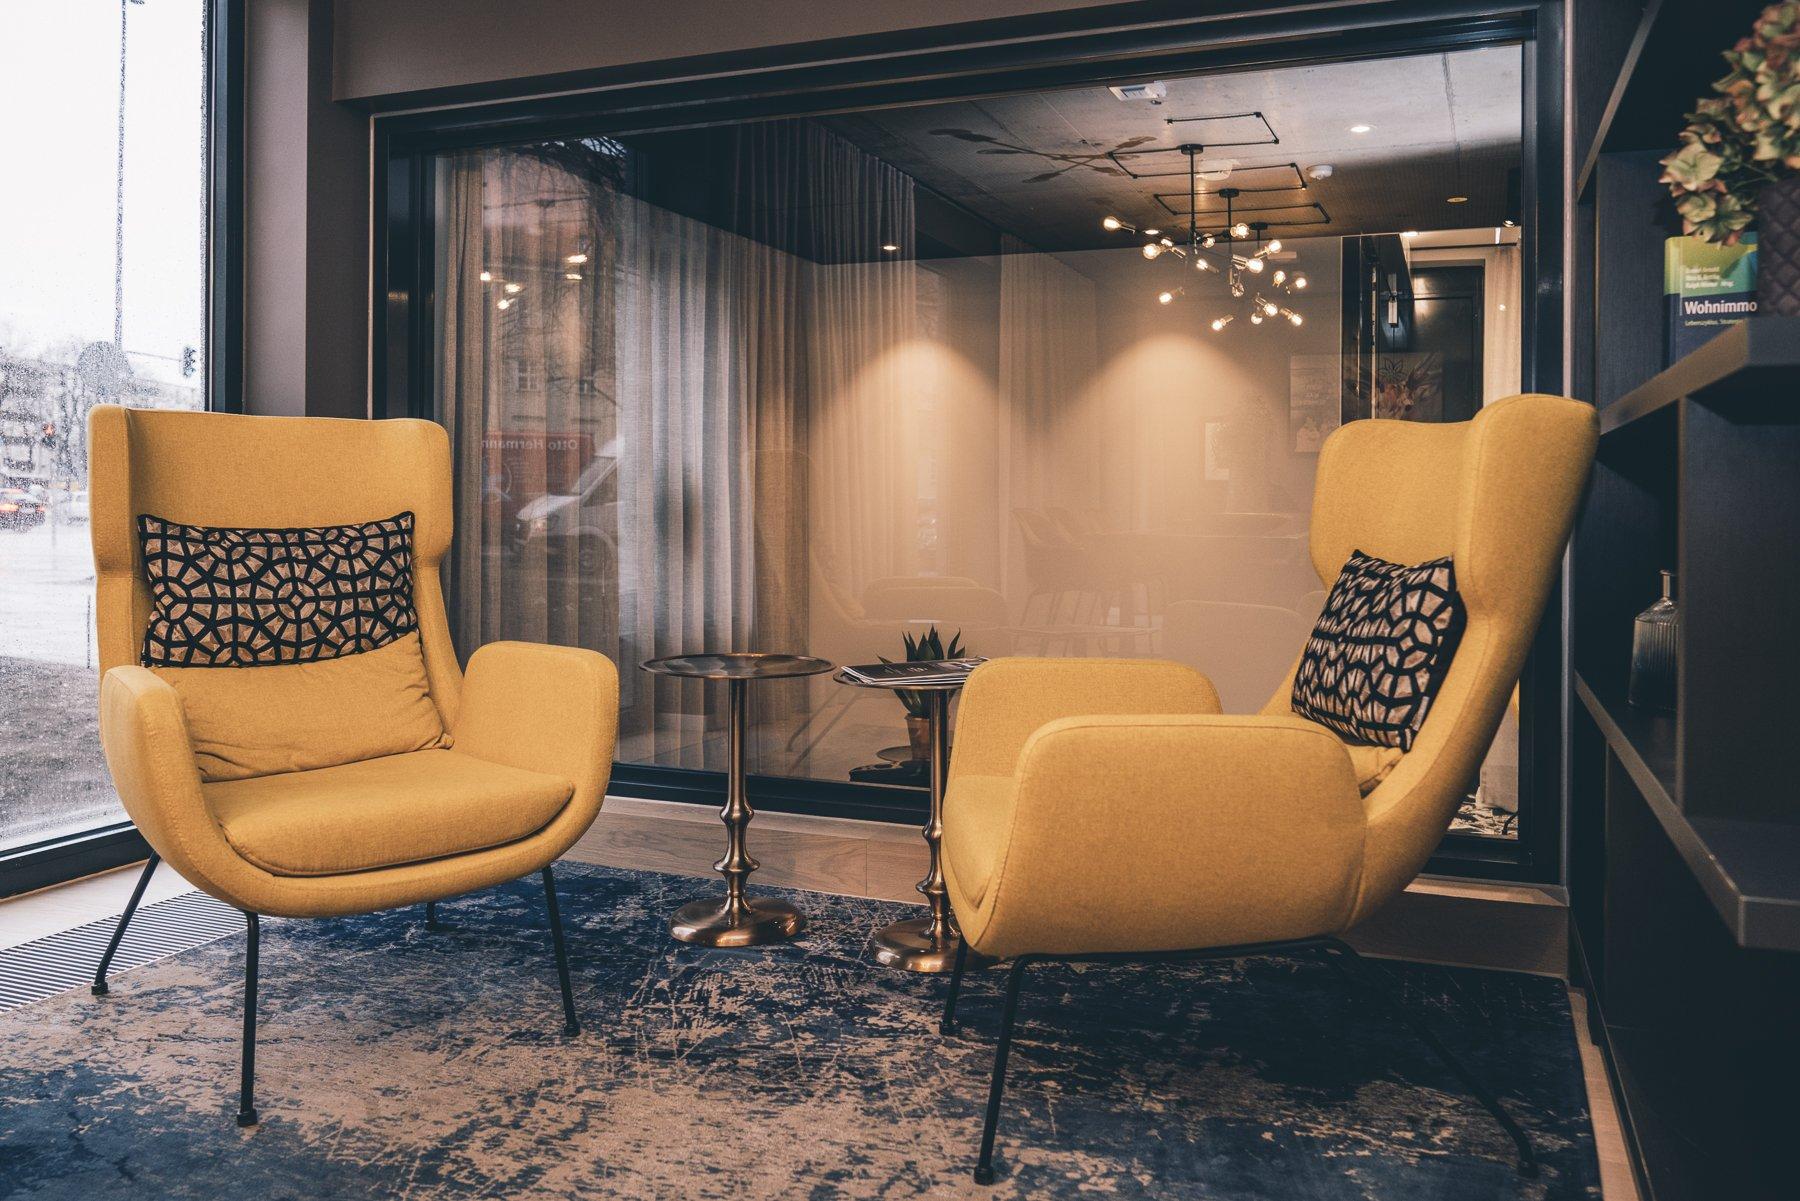 Geheimtipp Muenchen Hotel Joyn Apartments – ©wunderland media GmbH